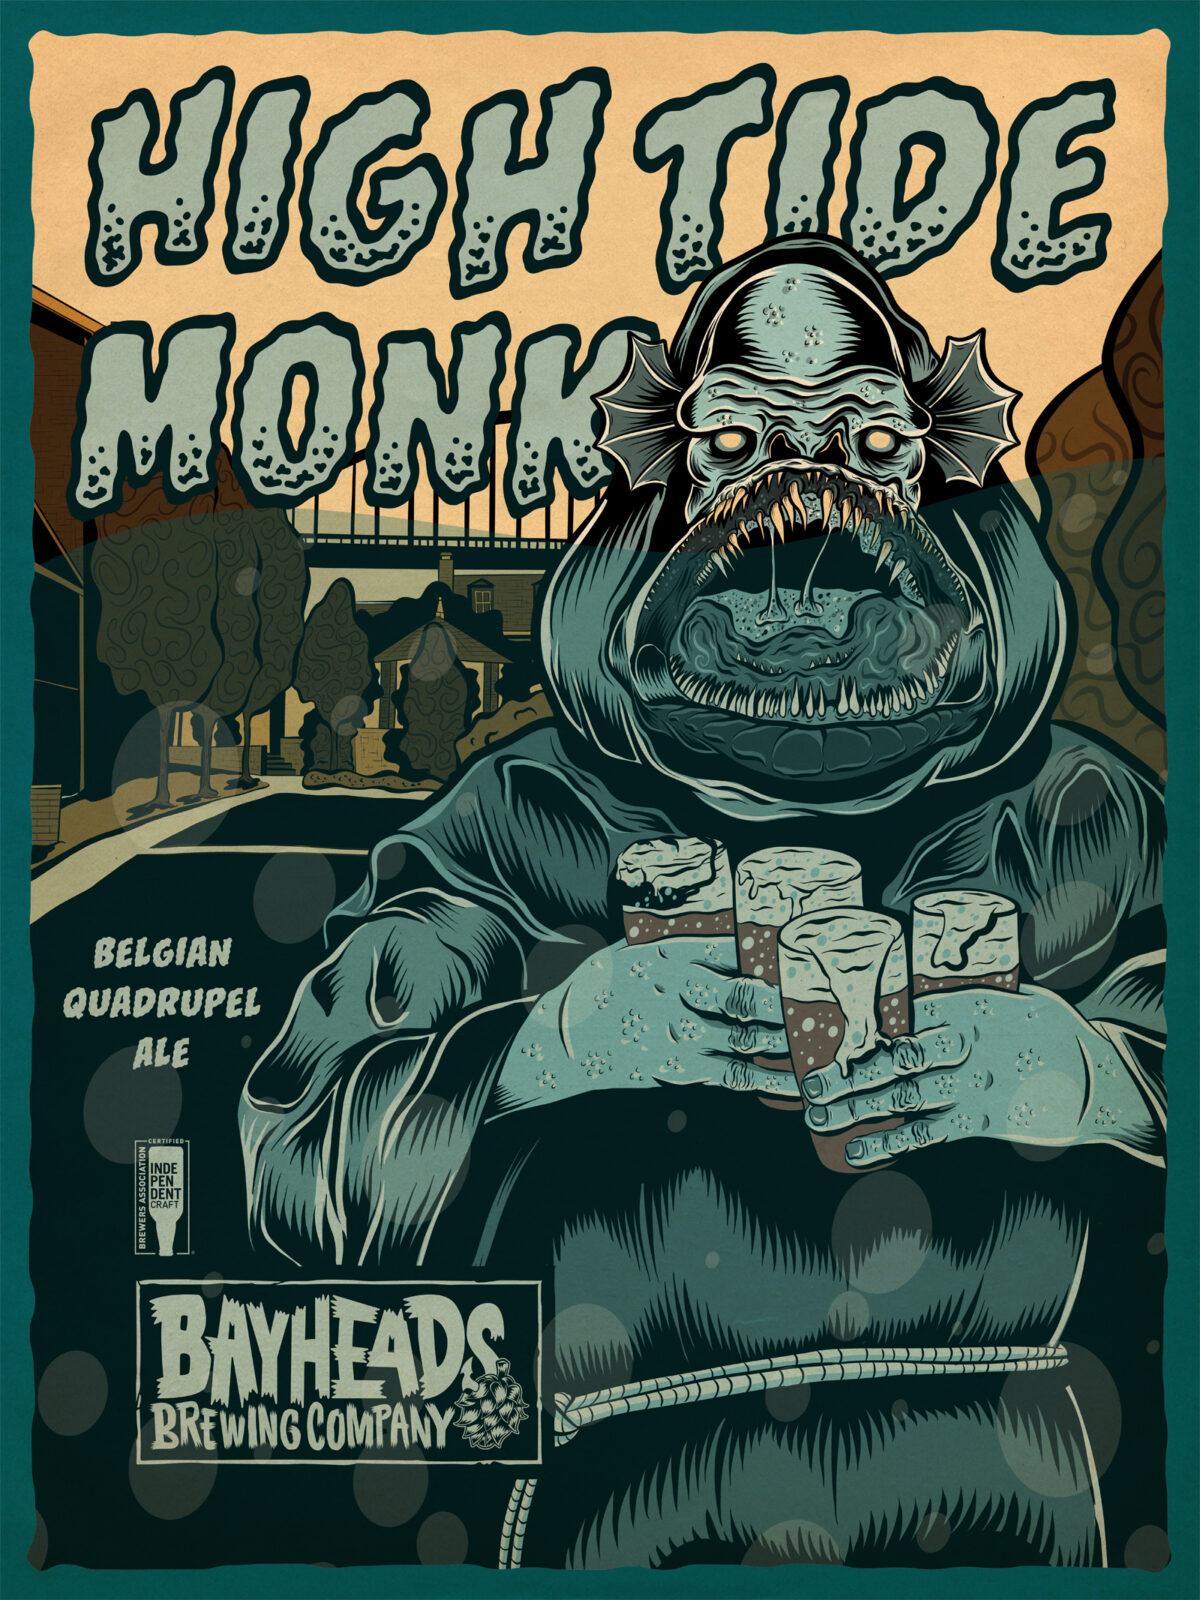 High Tide Monk – Bayheads Brewing Company